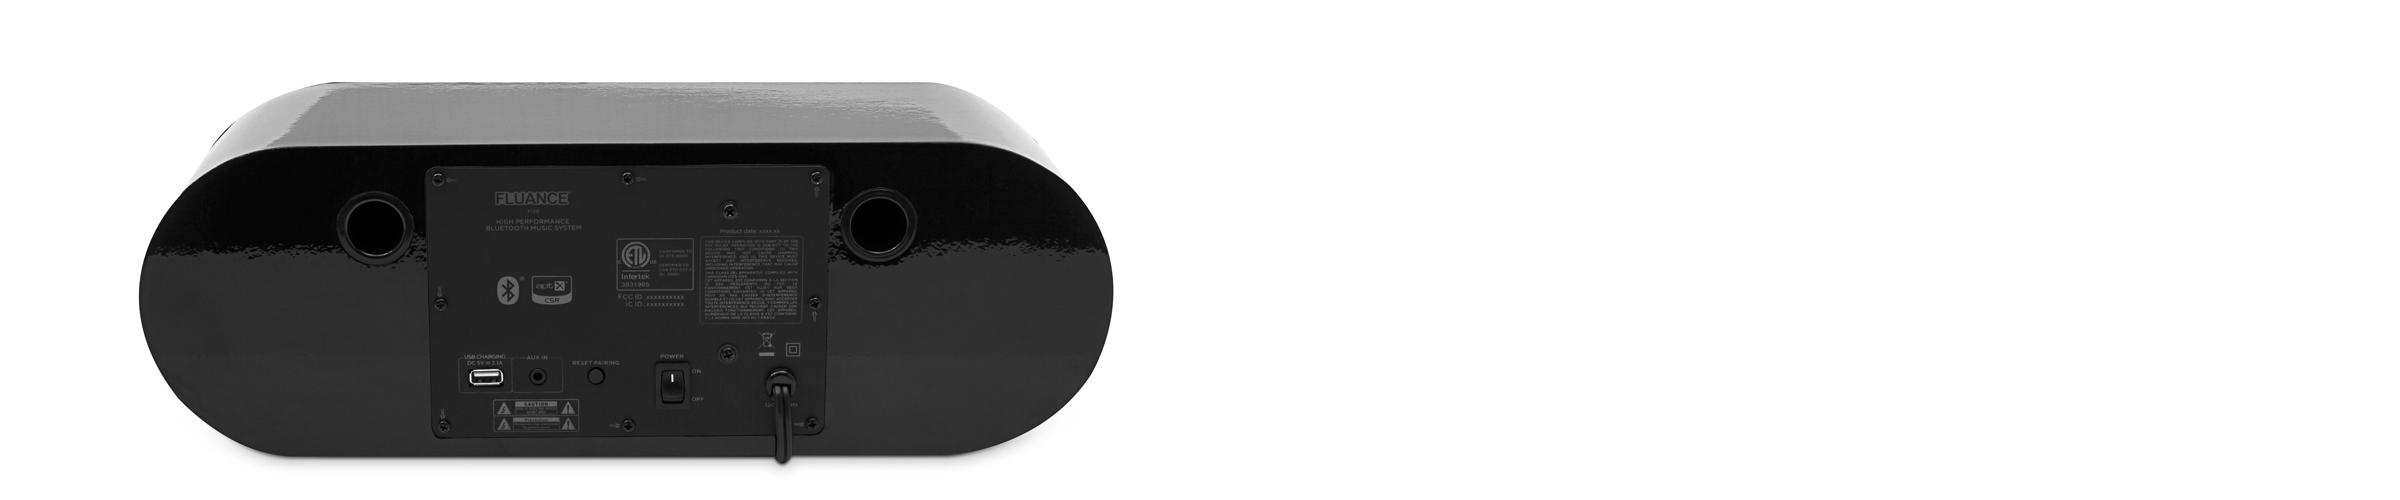 Fi30 bluetooth speaker back